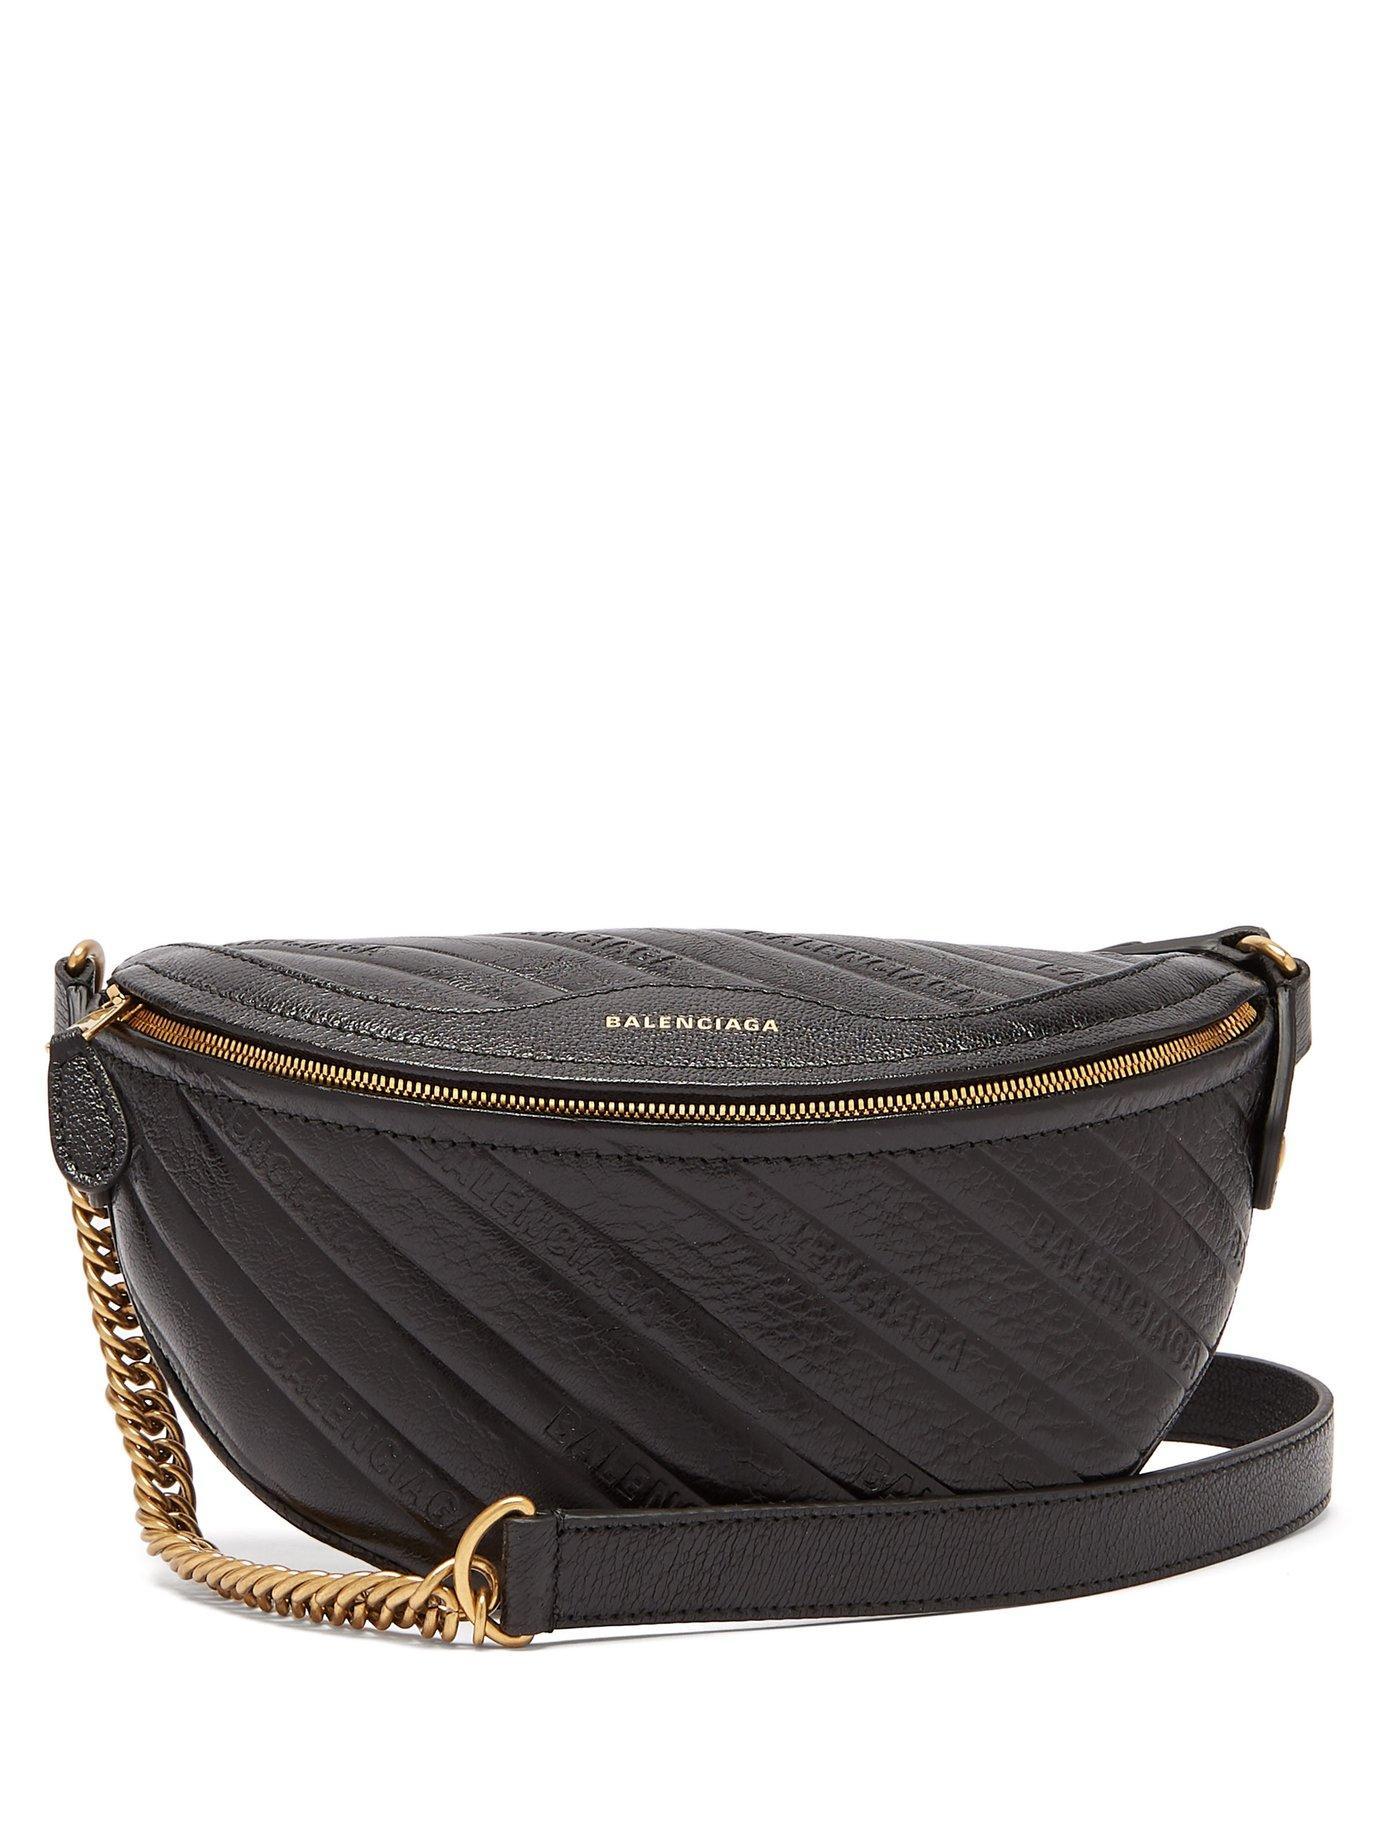 b185c2f7b44 Balenciaga - Black Souvenirs Xxs Logo Debossed Leather Belt Bag - Lyst.  View fullscreen